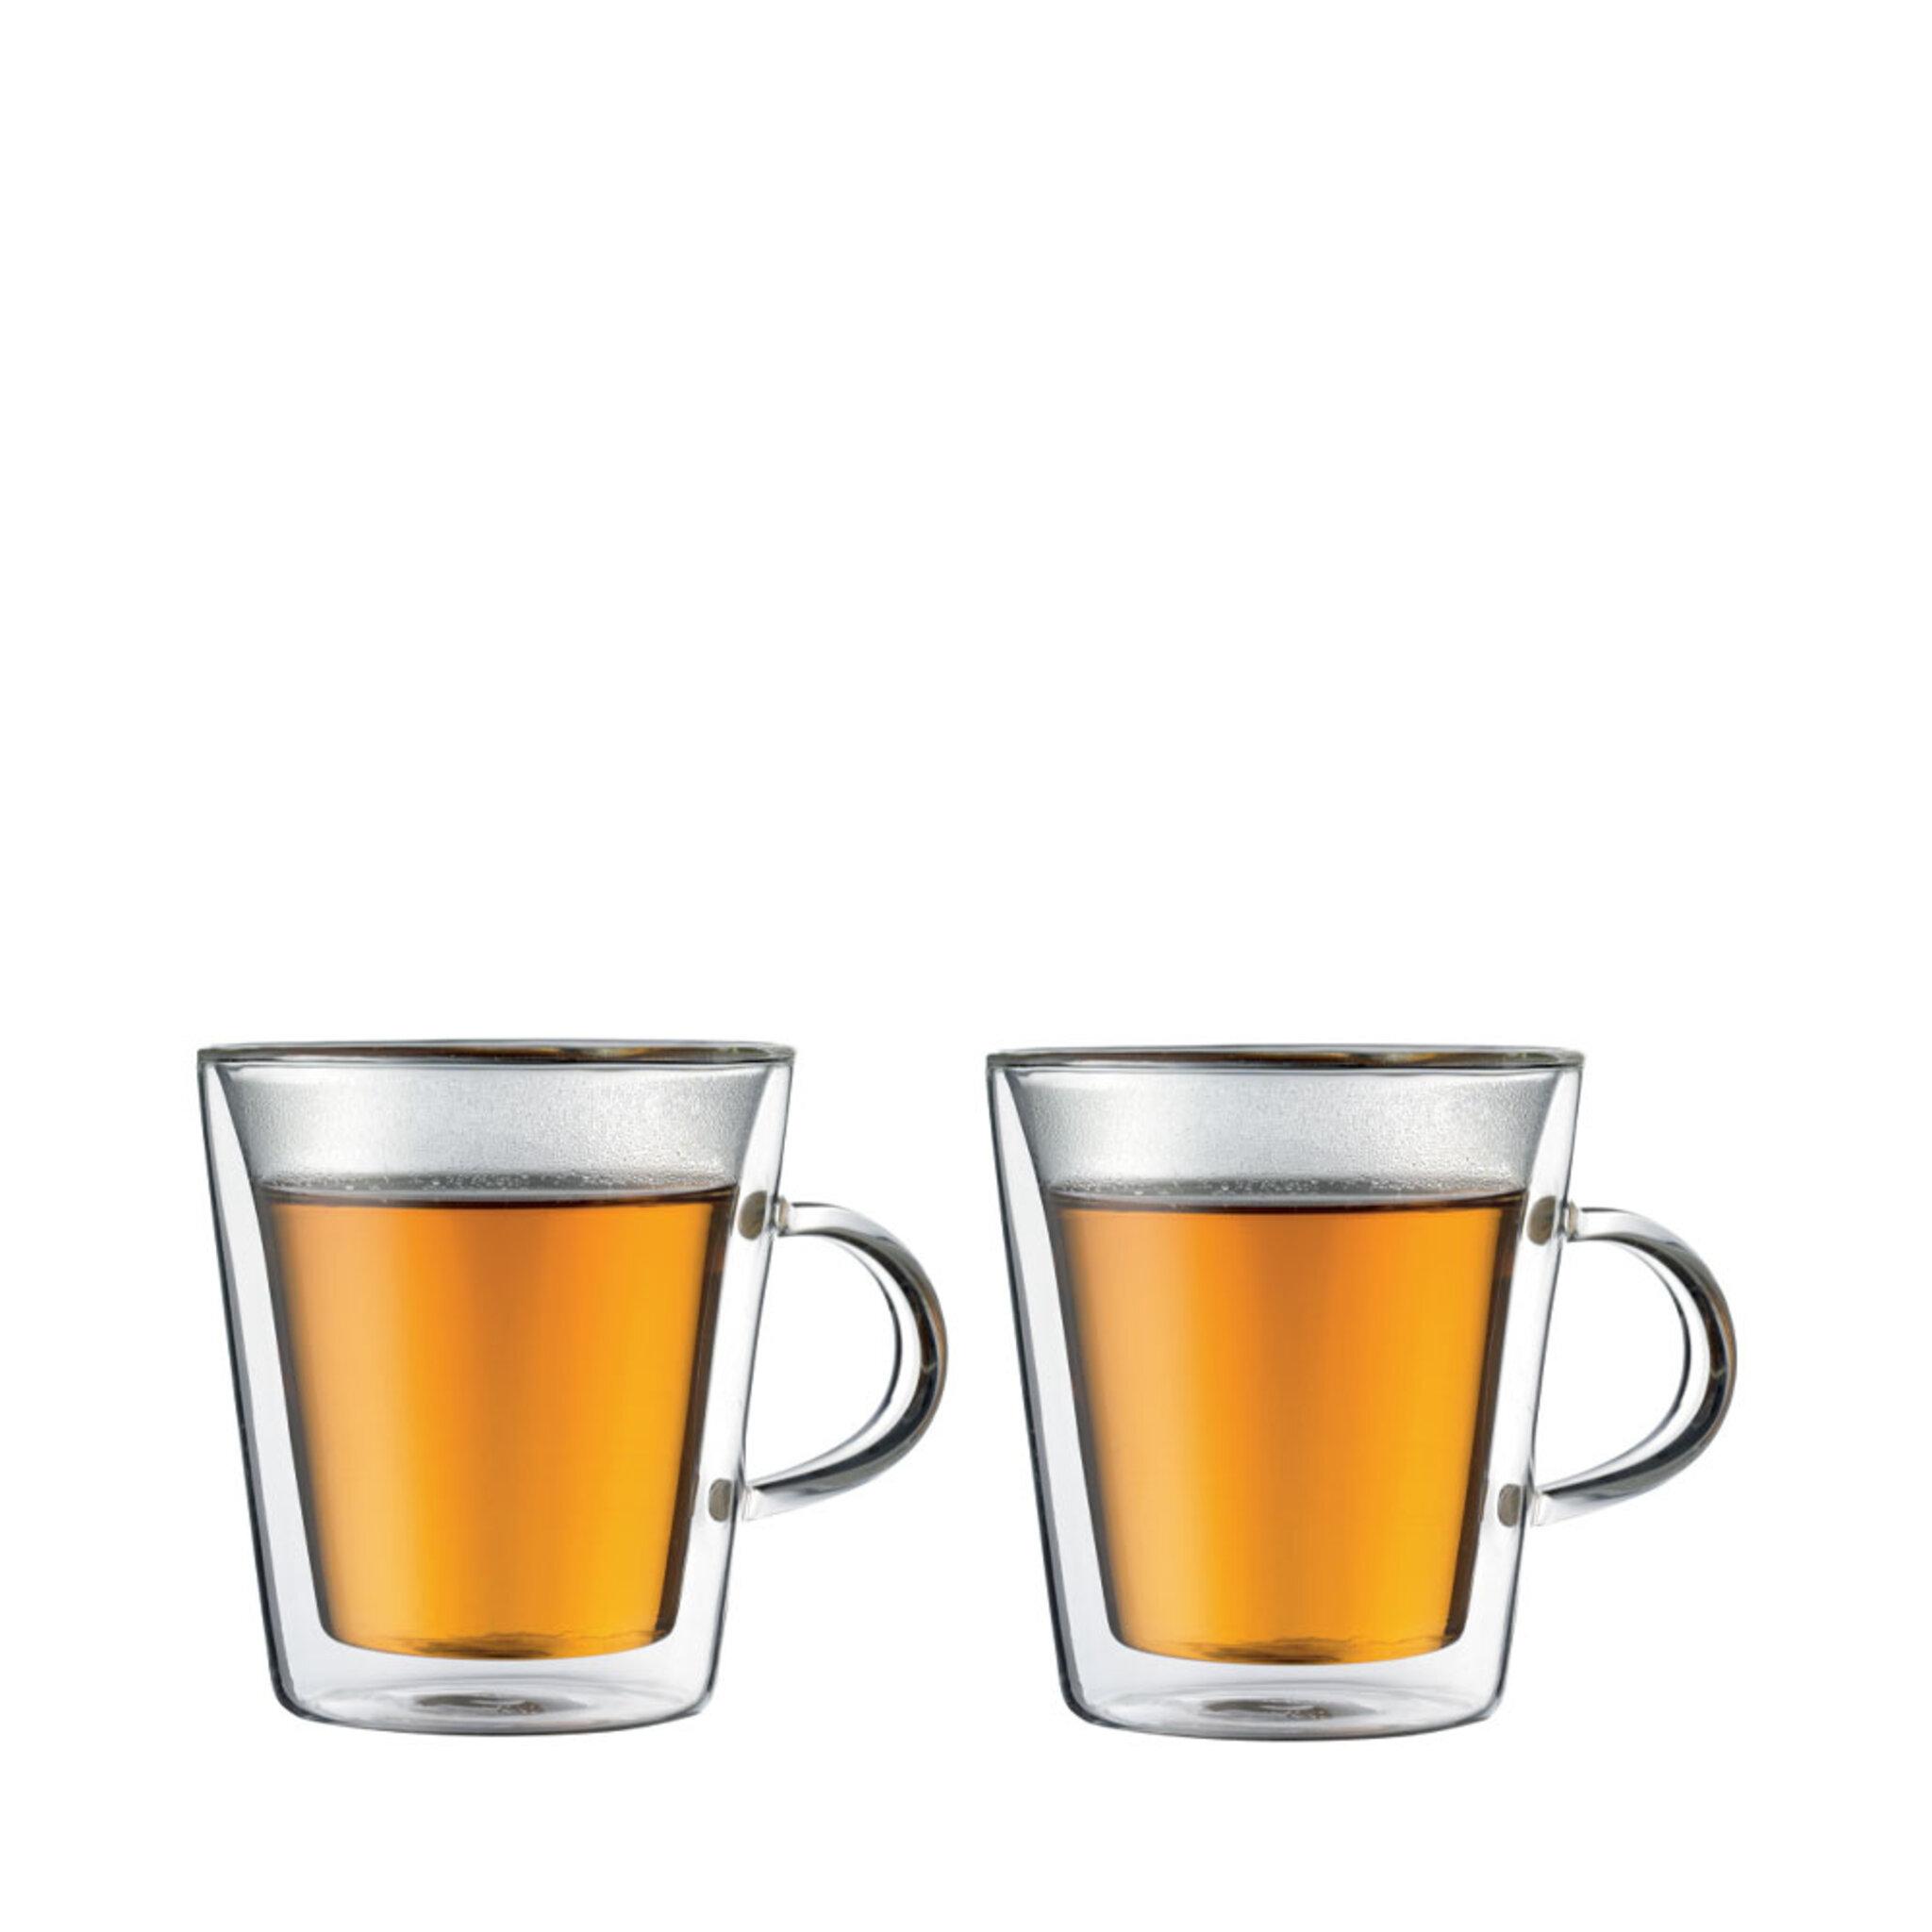 Dubbelväggat glas med öra 2-pack 20 CL